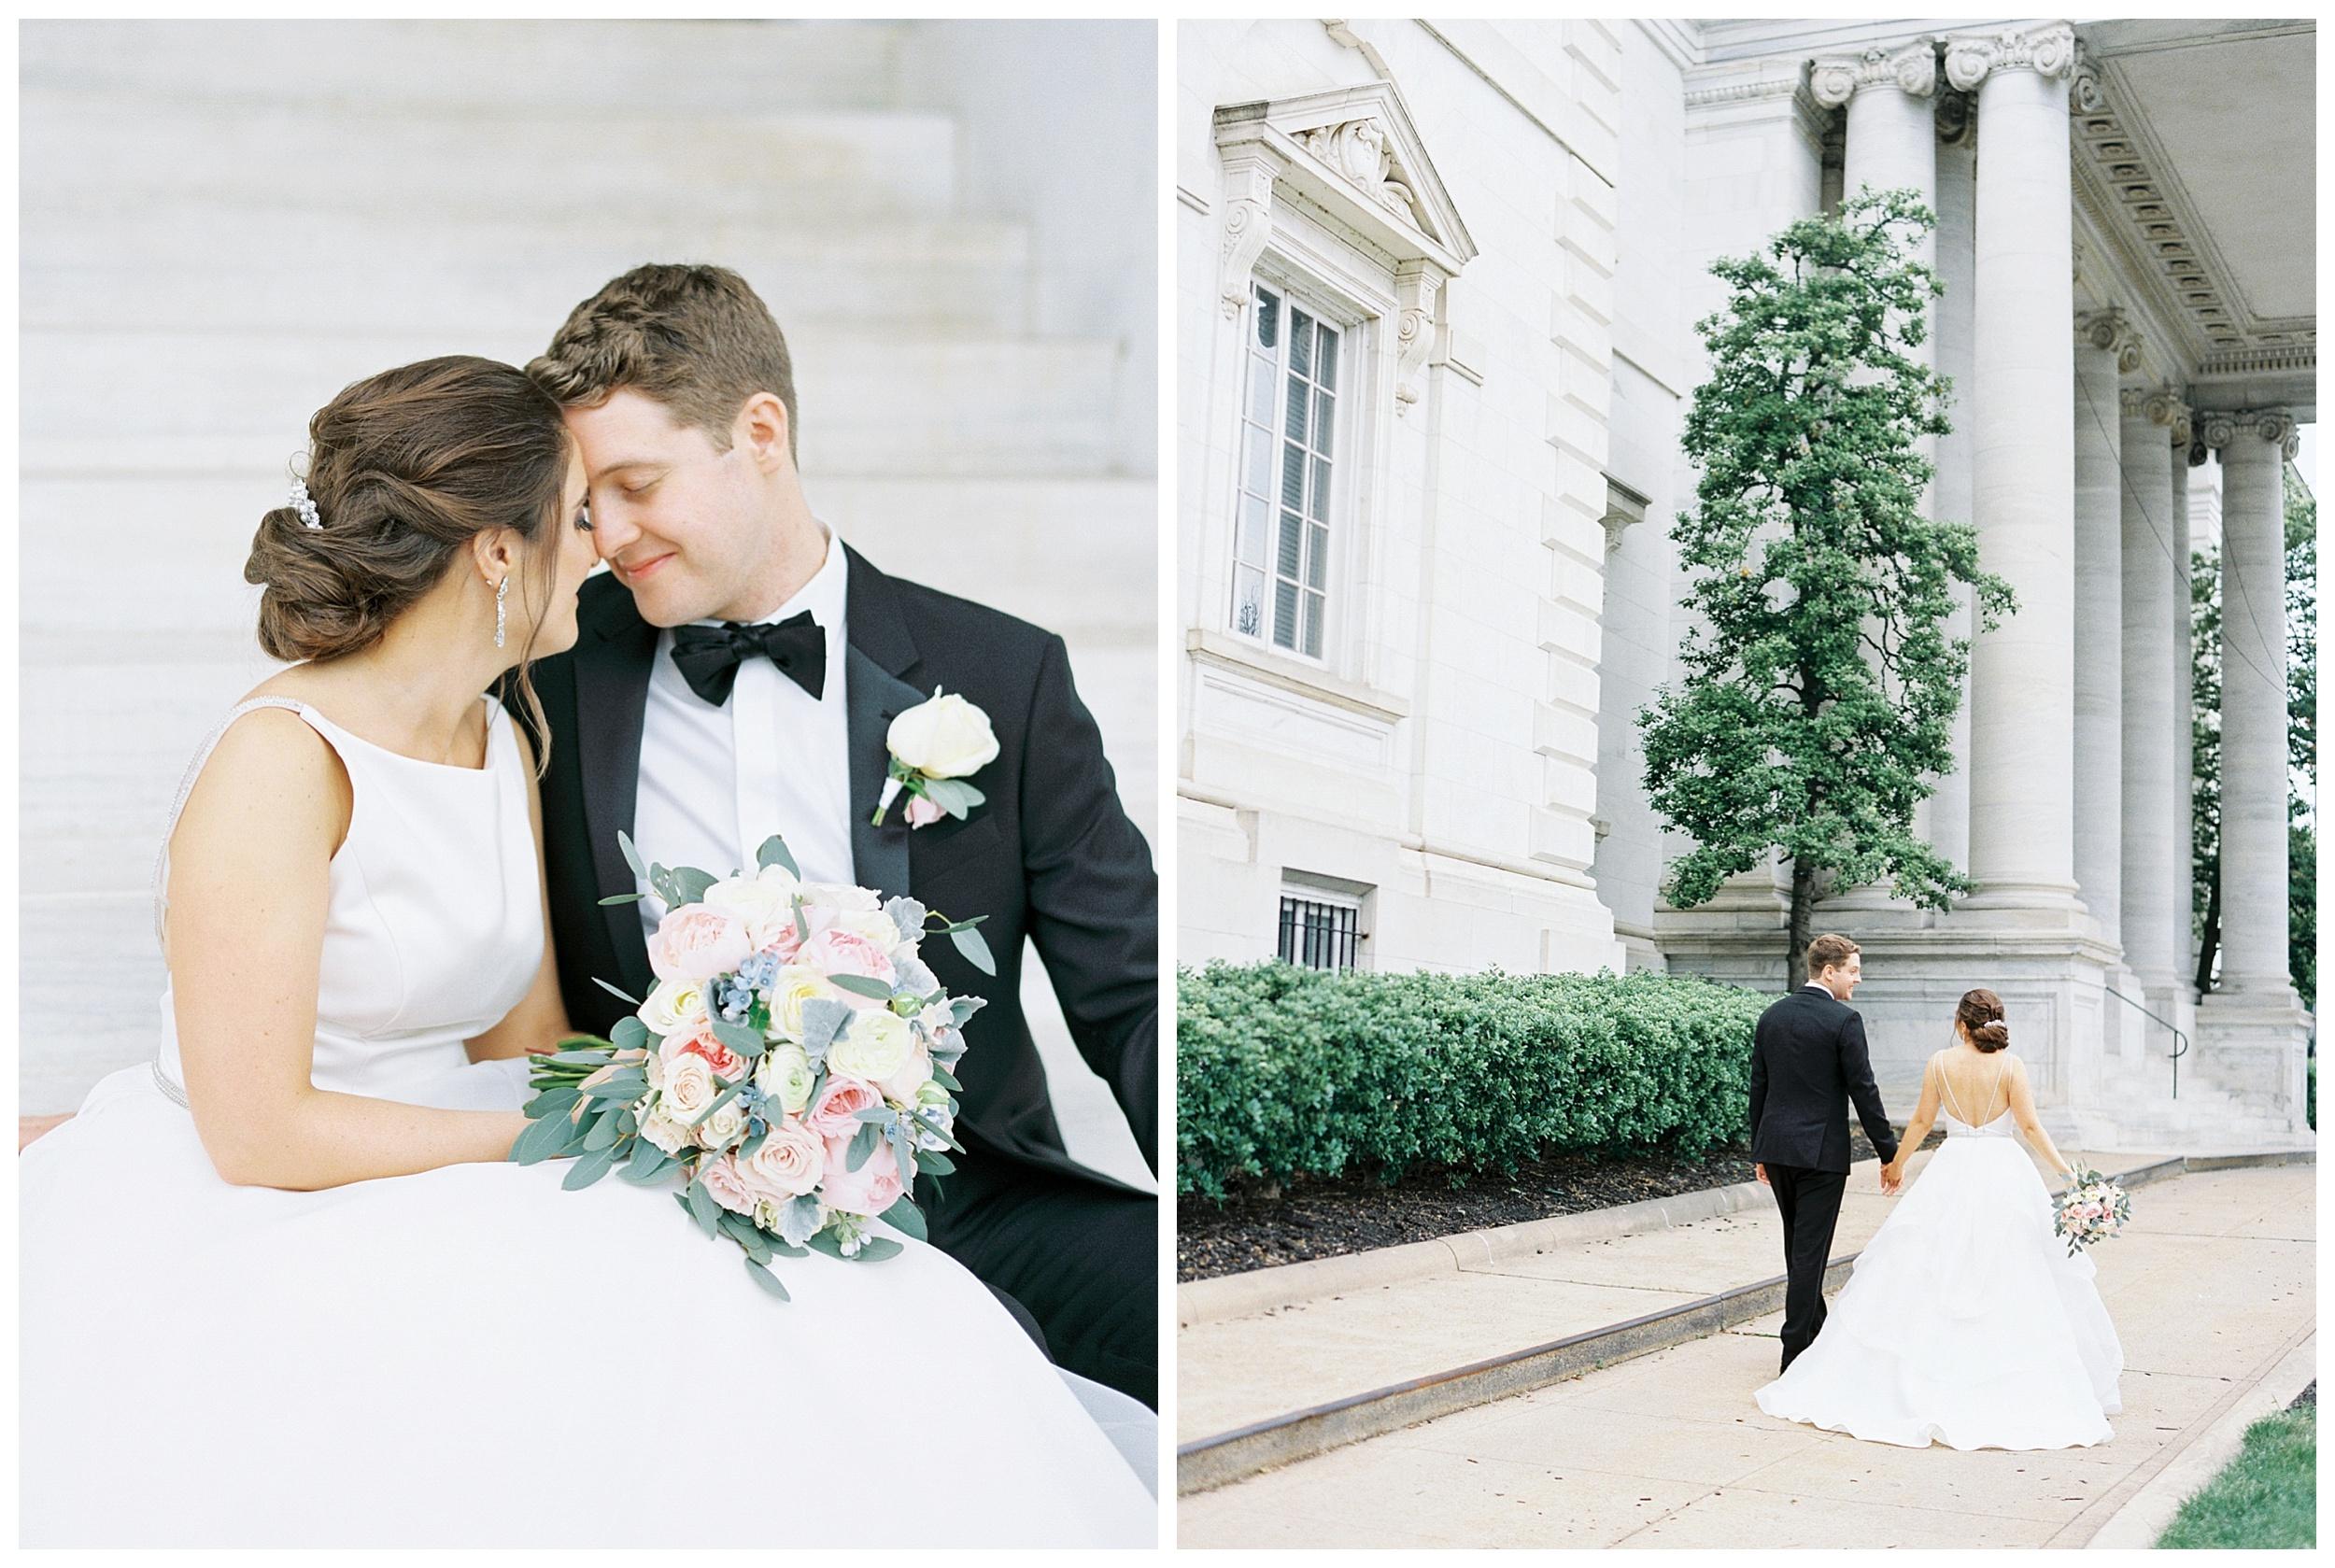 DAR Constitution Hall Wedding Wedding | Daughters of the American Revolution Wedding | District of Columbia Film Wedding Photographer Kir Tuben_0106.jpg